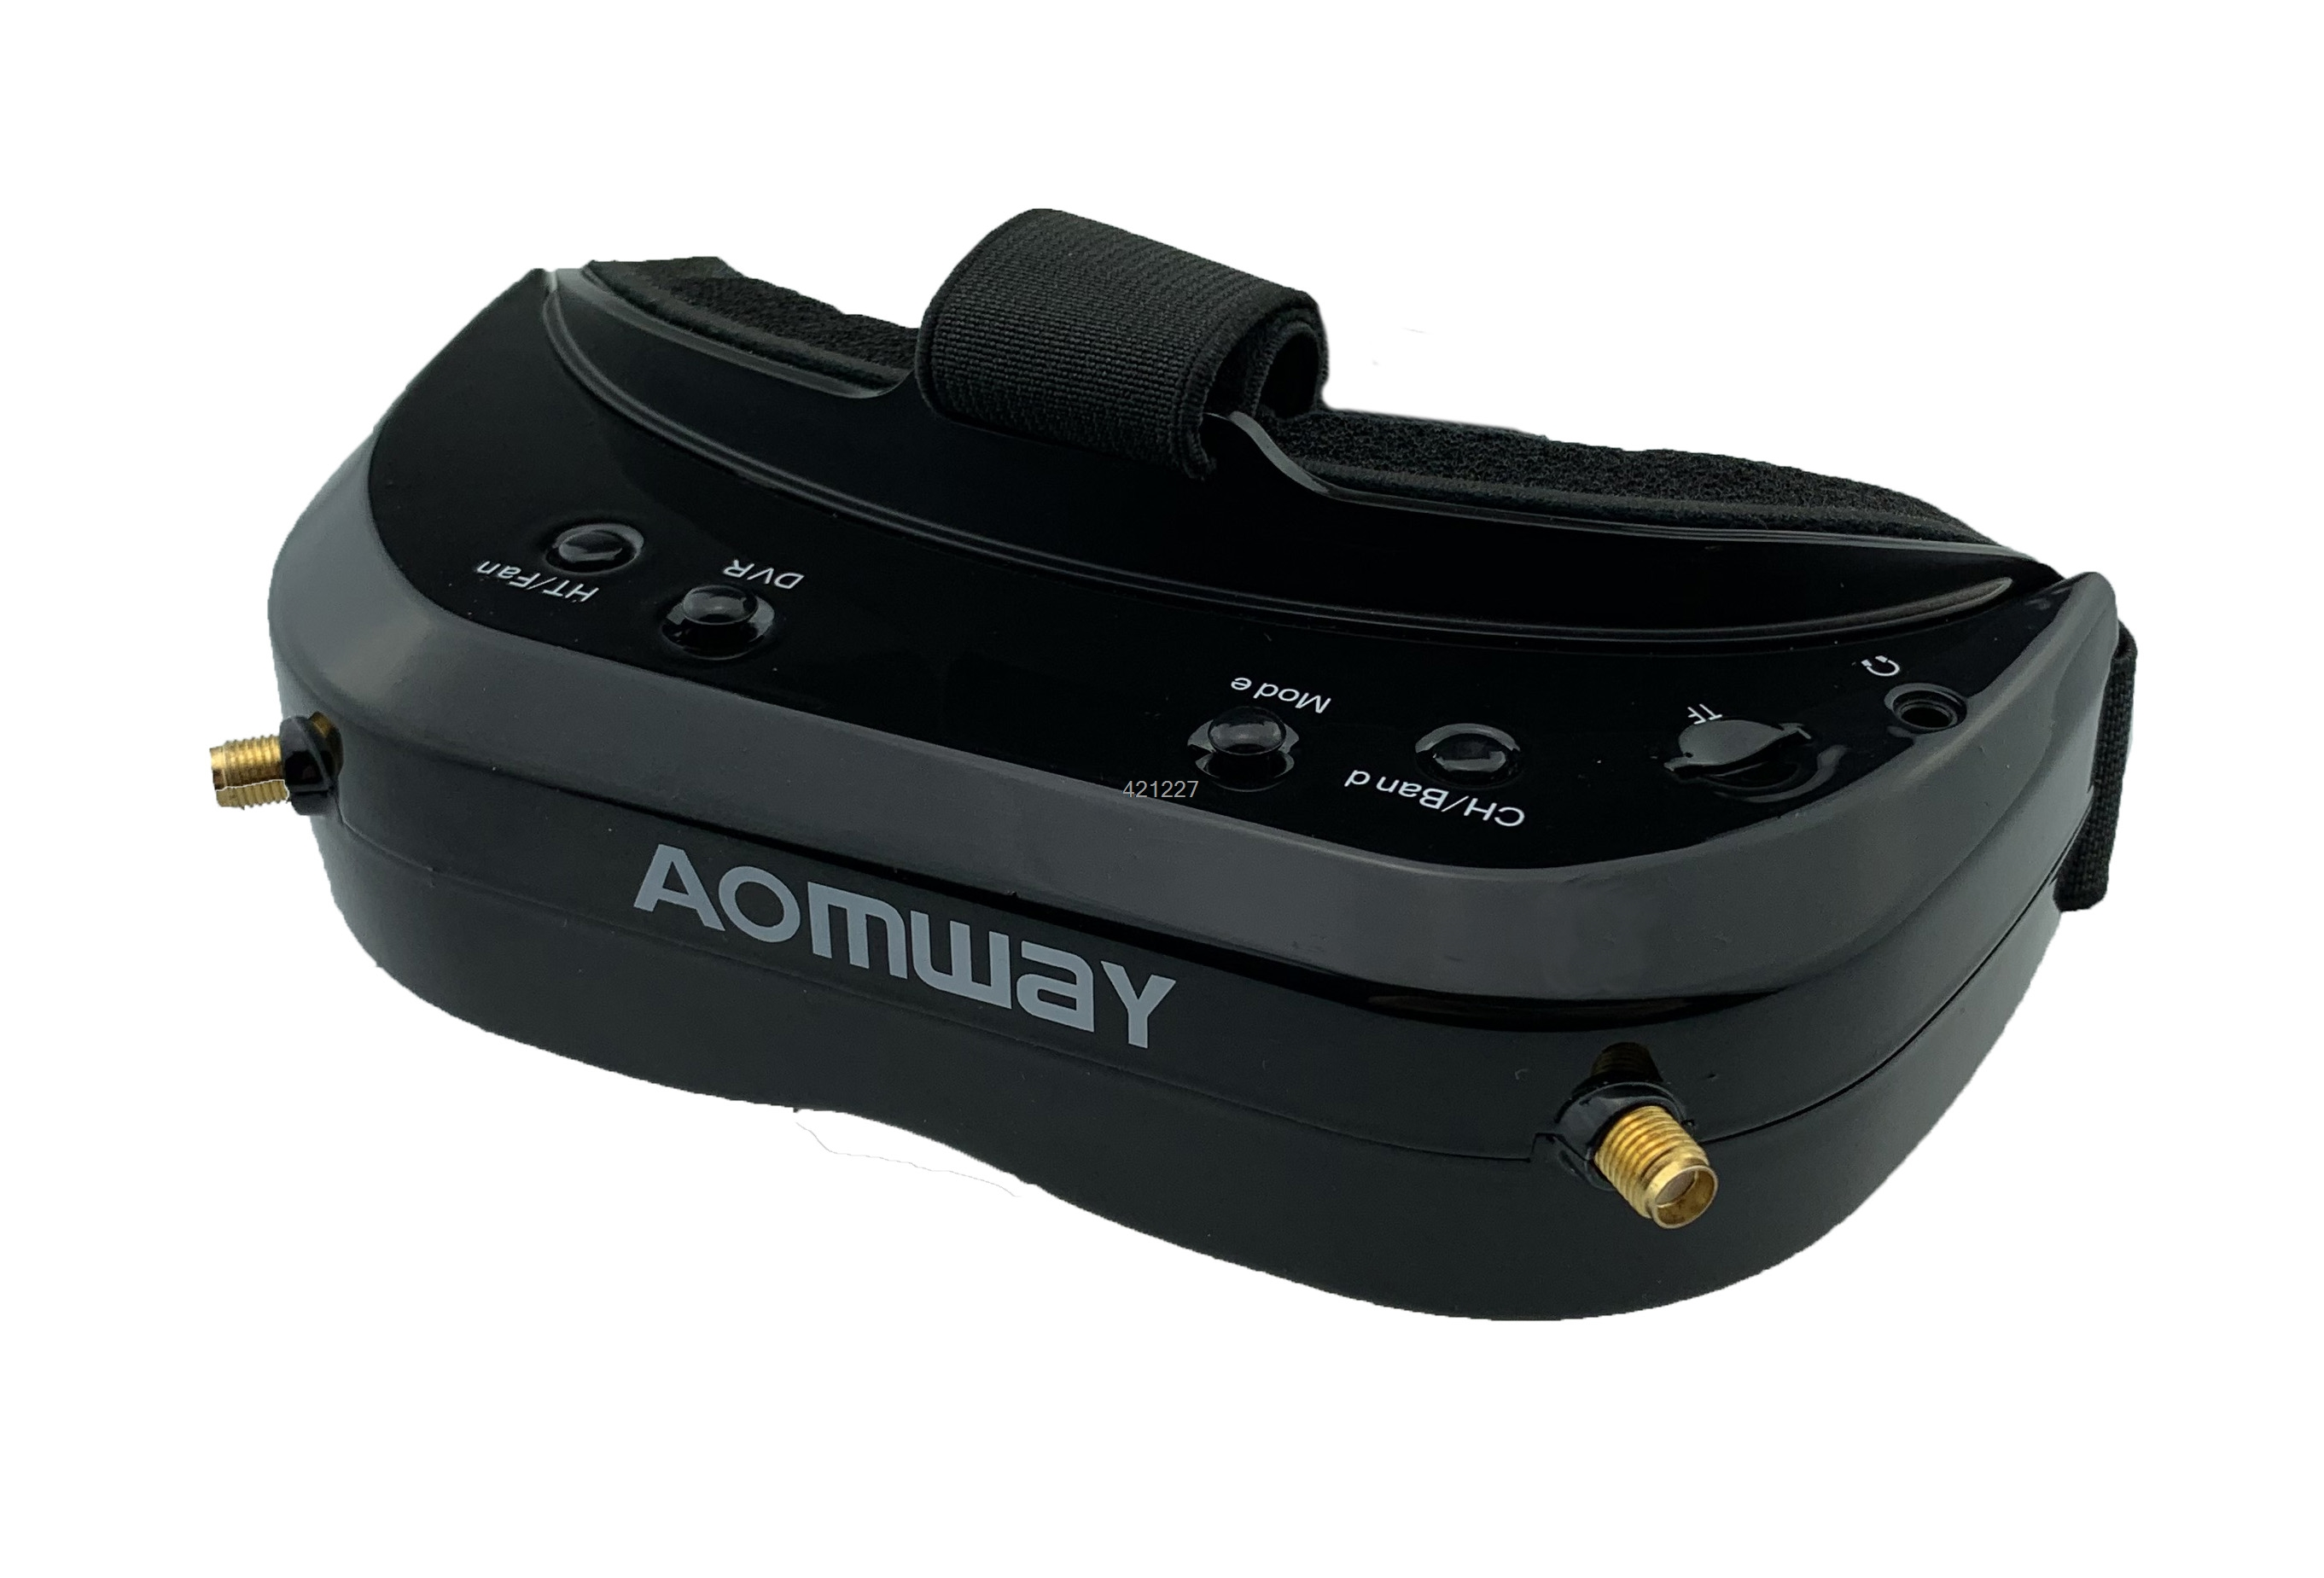 2019 New Aomway Commander Goggles V1S 2D 3D 64CH 5.8G FPV Video Headset Support HDMI 720p DVR Headtracker Instead V1 v2 - 3